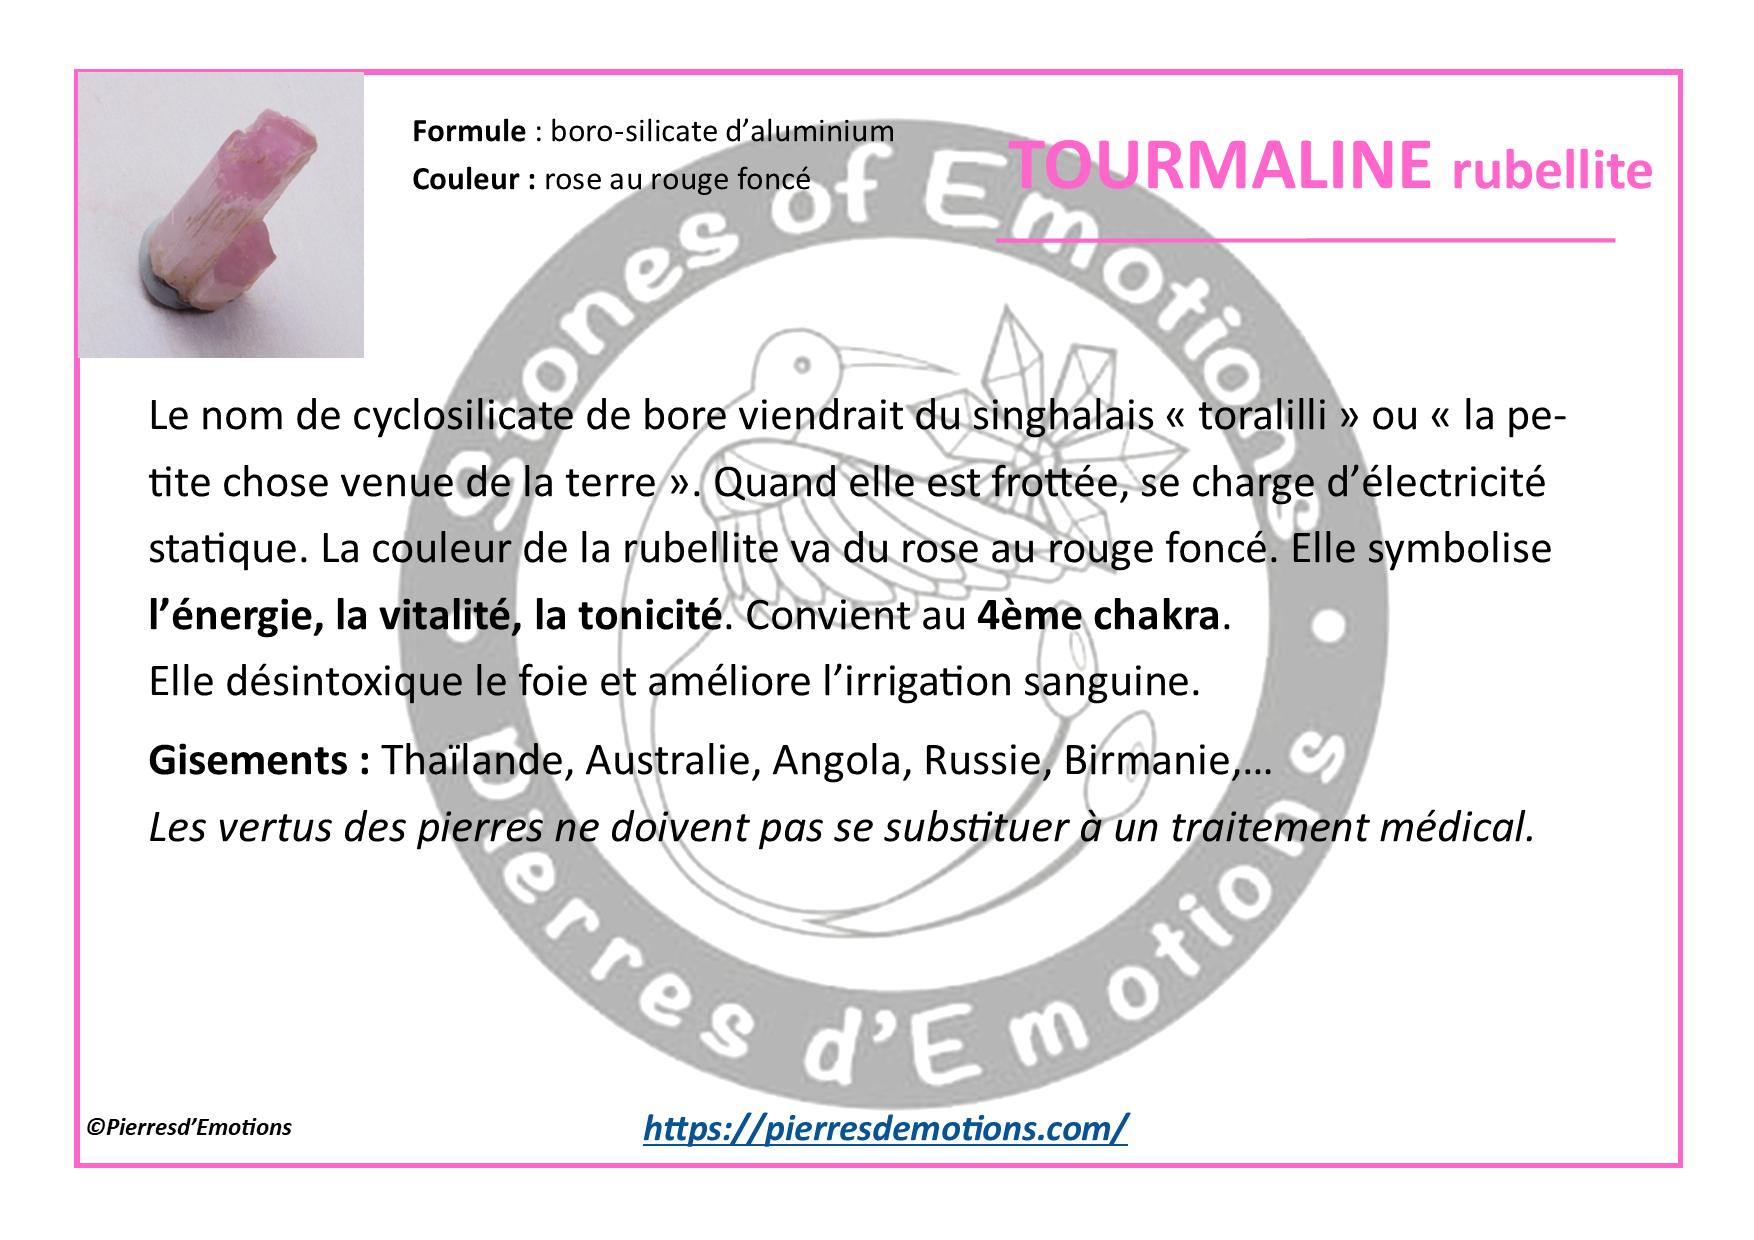 TourmalineRubellite